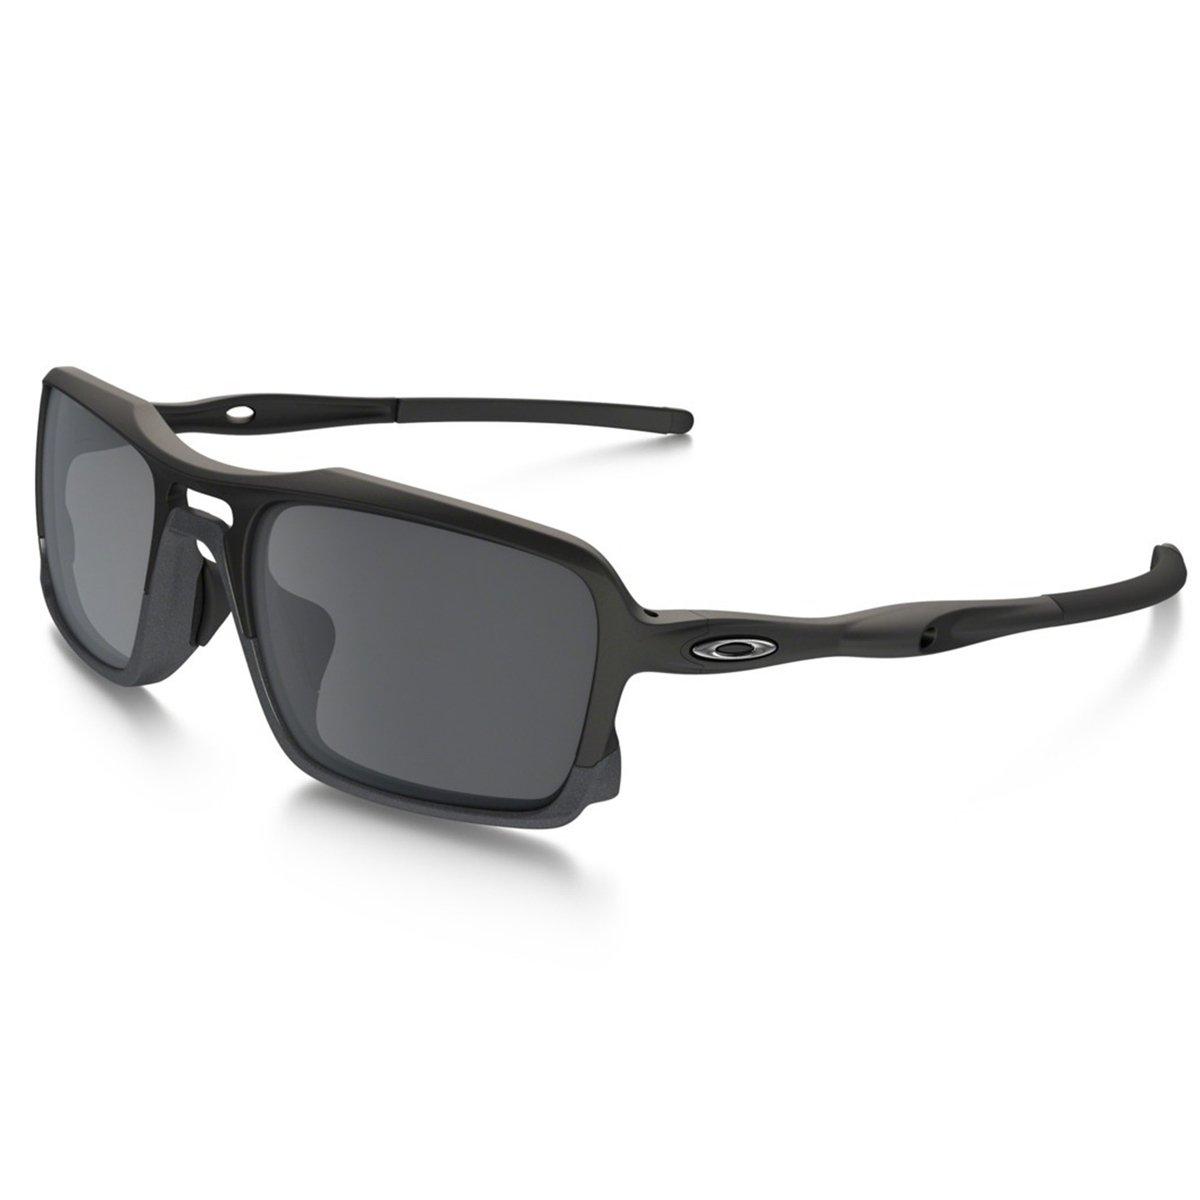 fa35b4b645abc Óculos Oakley Triggerman Matte Black Black Iridium - Compre Agora ...